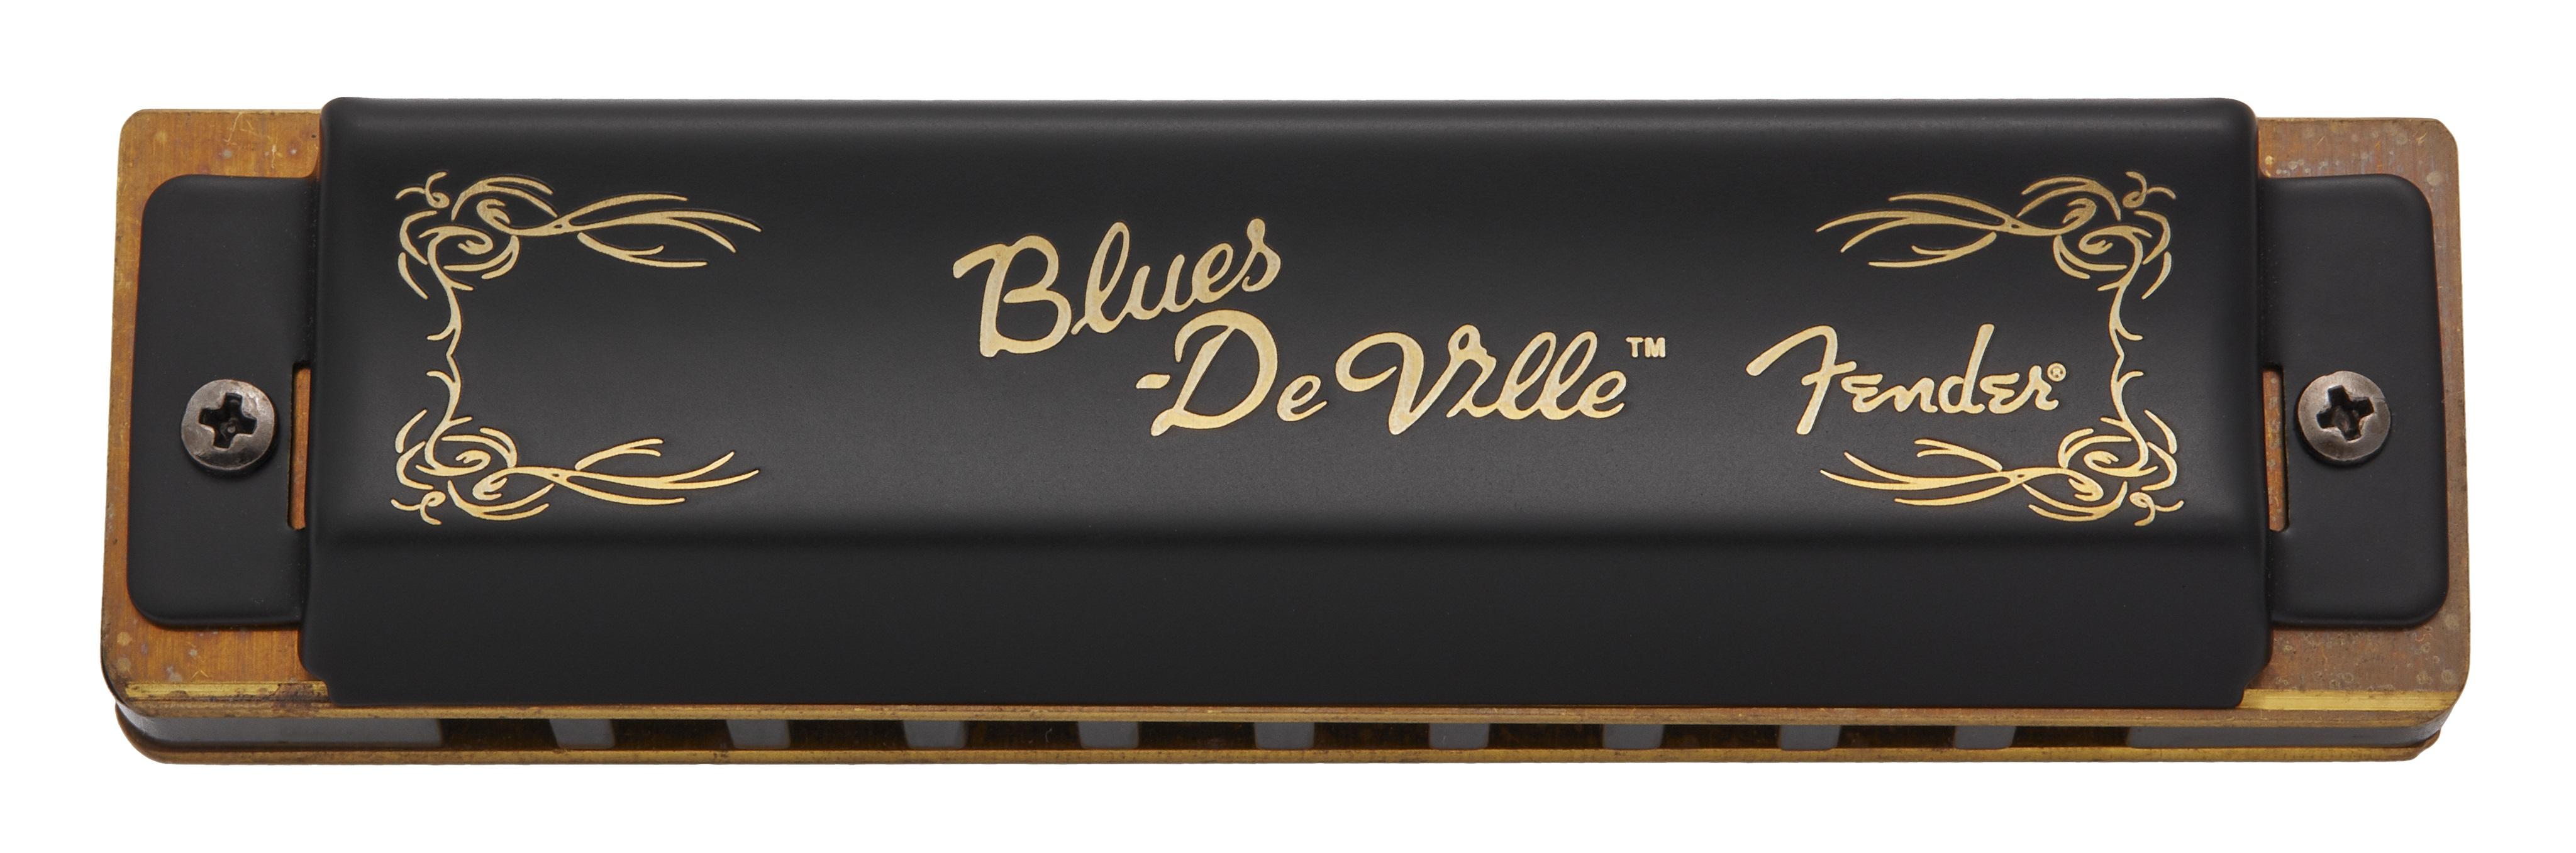 Fender Blues DeVille Key of D